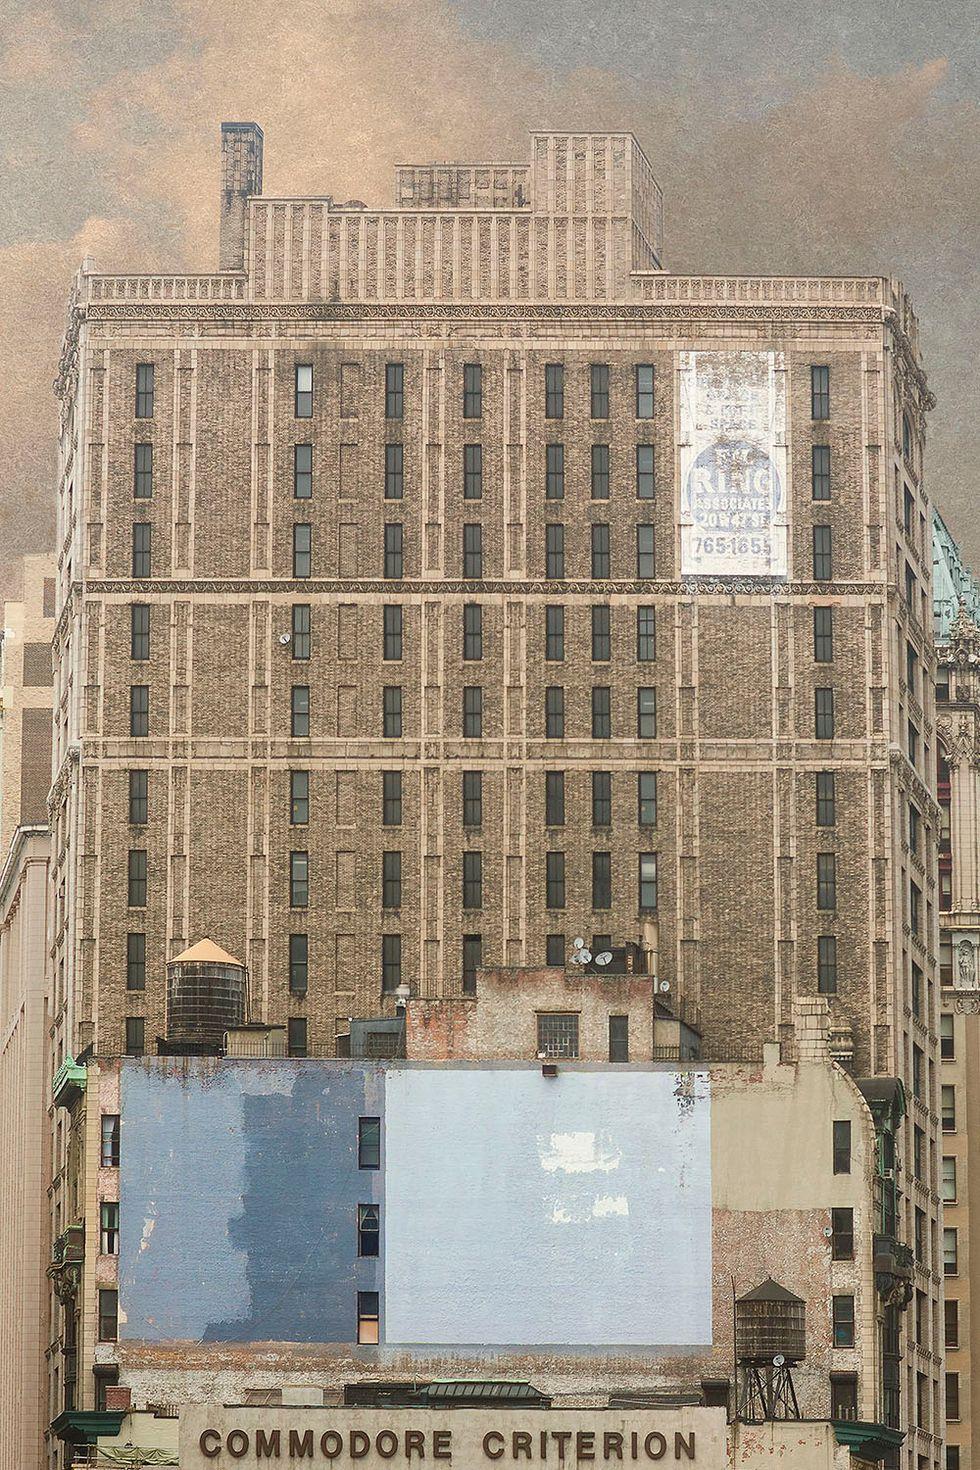 Photographer Marc Yankus Captures New York's Obscure, Beautiful Buildings